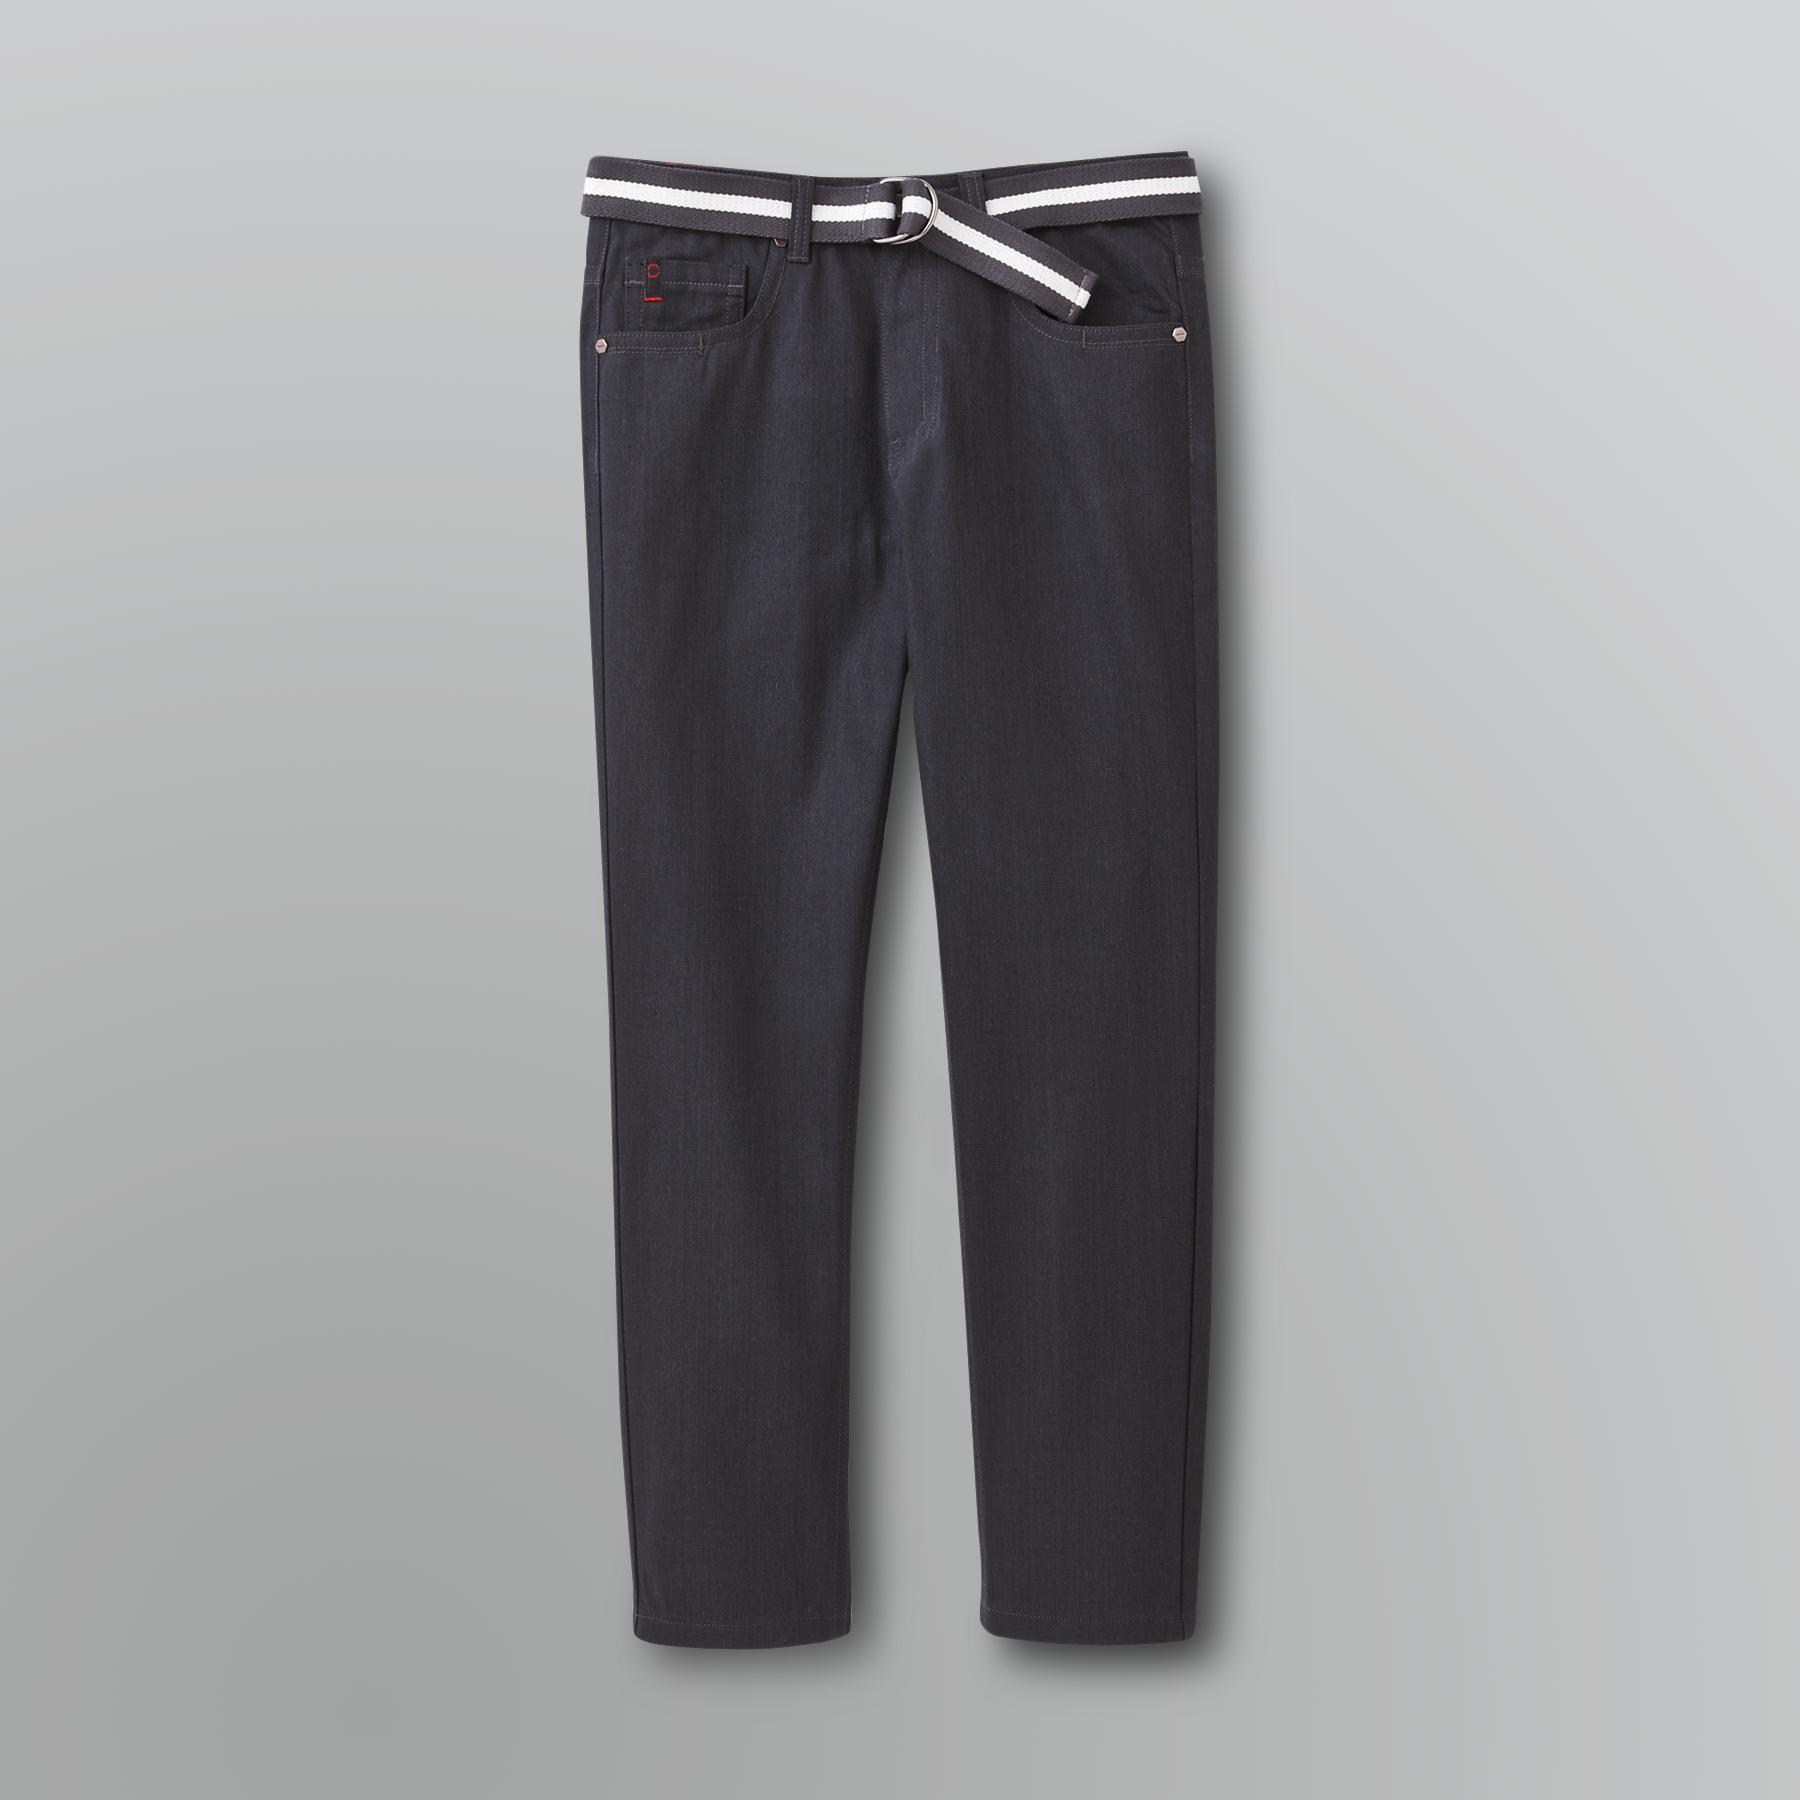 Southpole Young Men's Denim Jeans & Belt at Sears.com